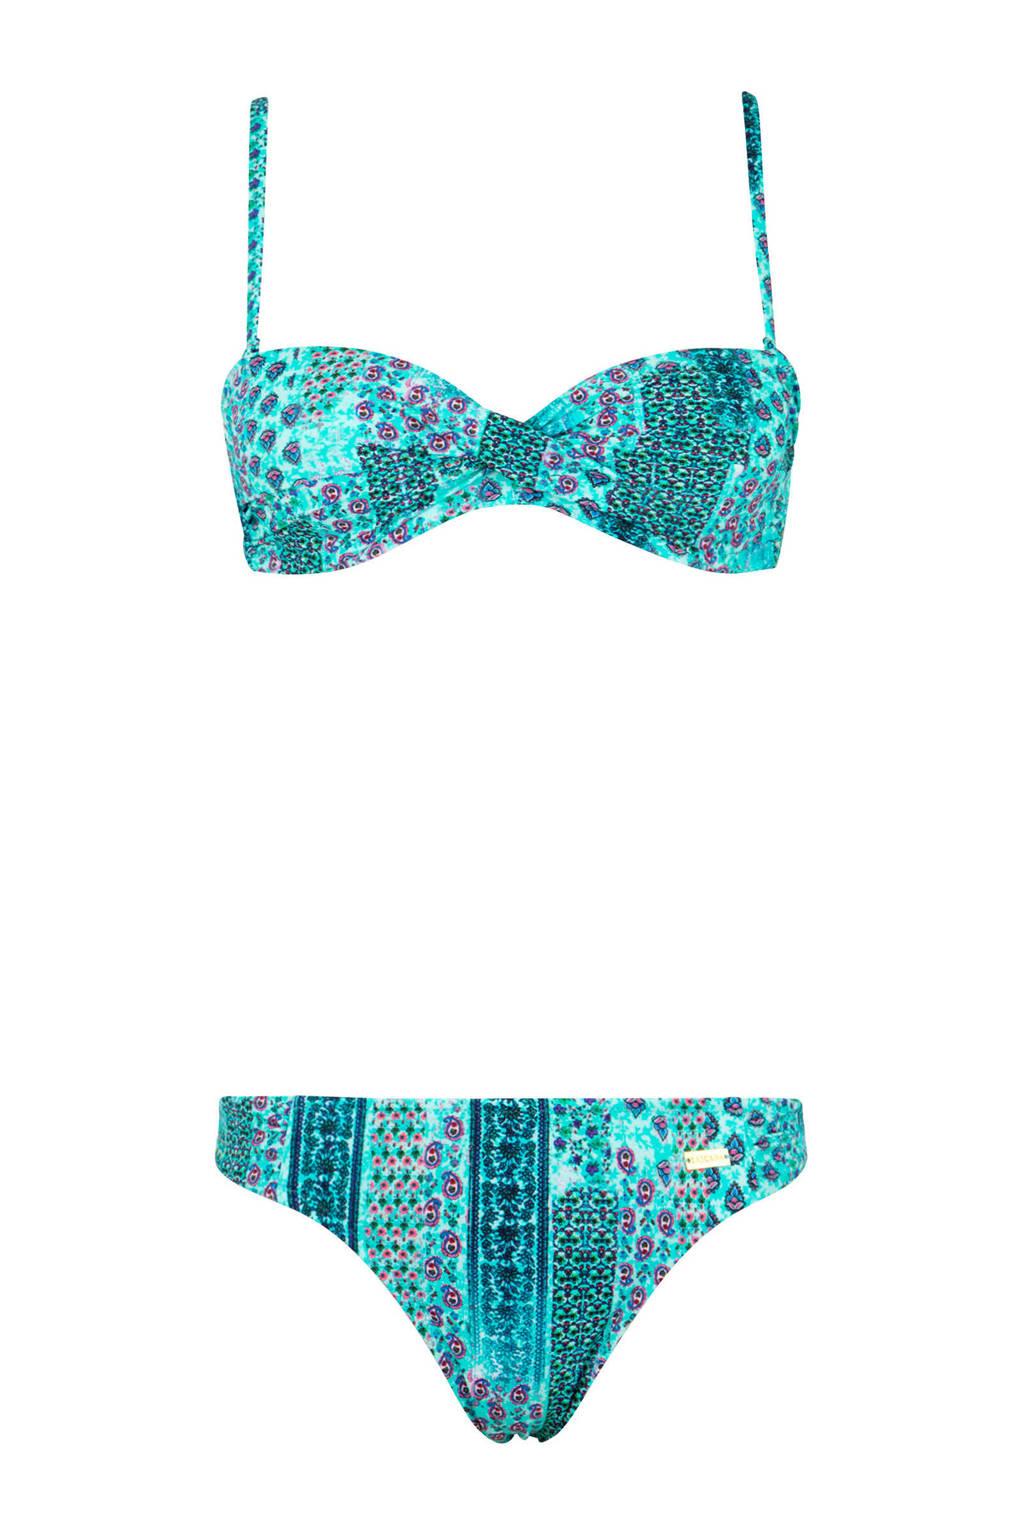 Lascana strapless beugel bikini met all over print lichtblauw, Lichtblauw